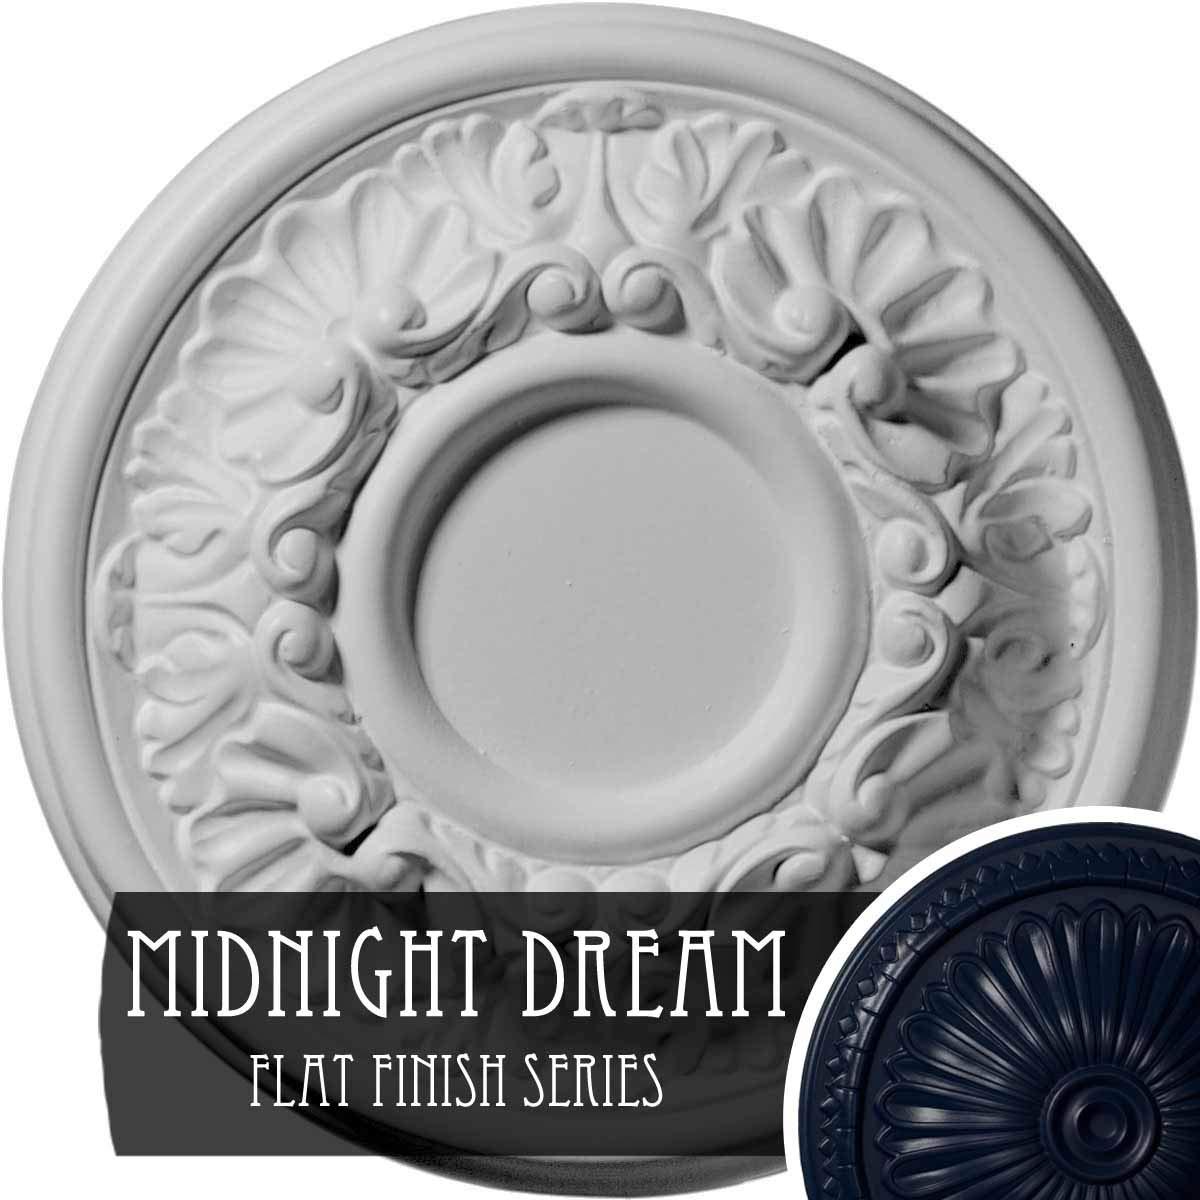 Ekena Millwork CM07ODMDF Ceiling Medallion 7 OD x 1 1/8'' P Odessa (fits Canopies up to 2 1/2''), Midnight Dream